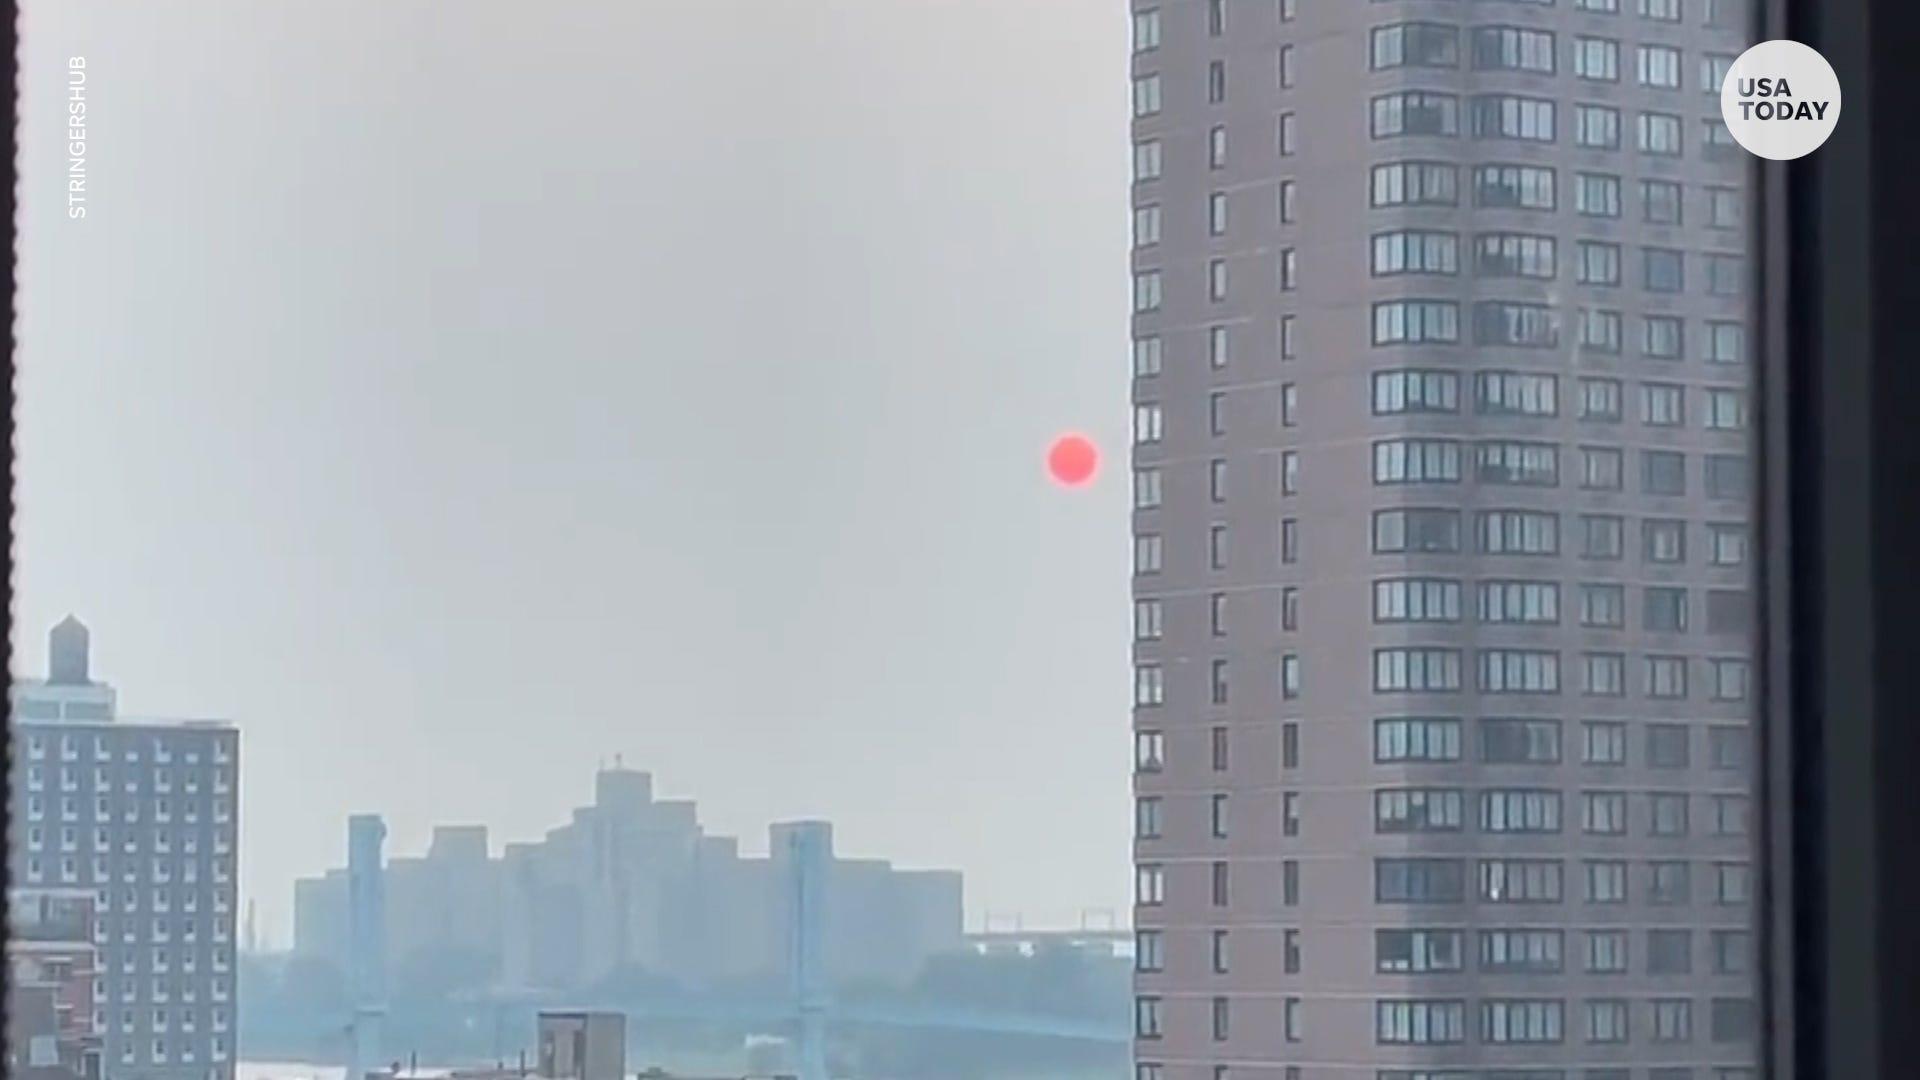 Western wildfires create fiery New York sunrise